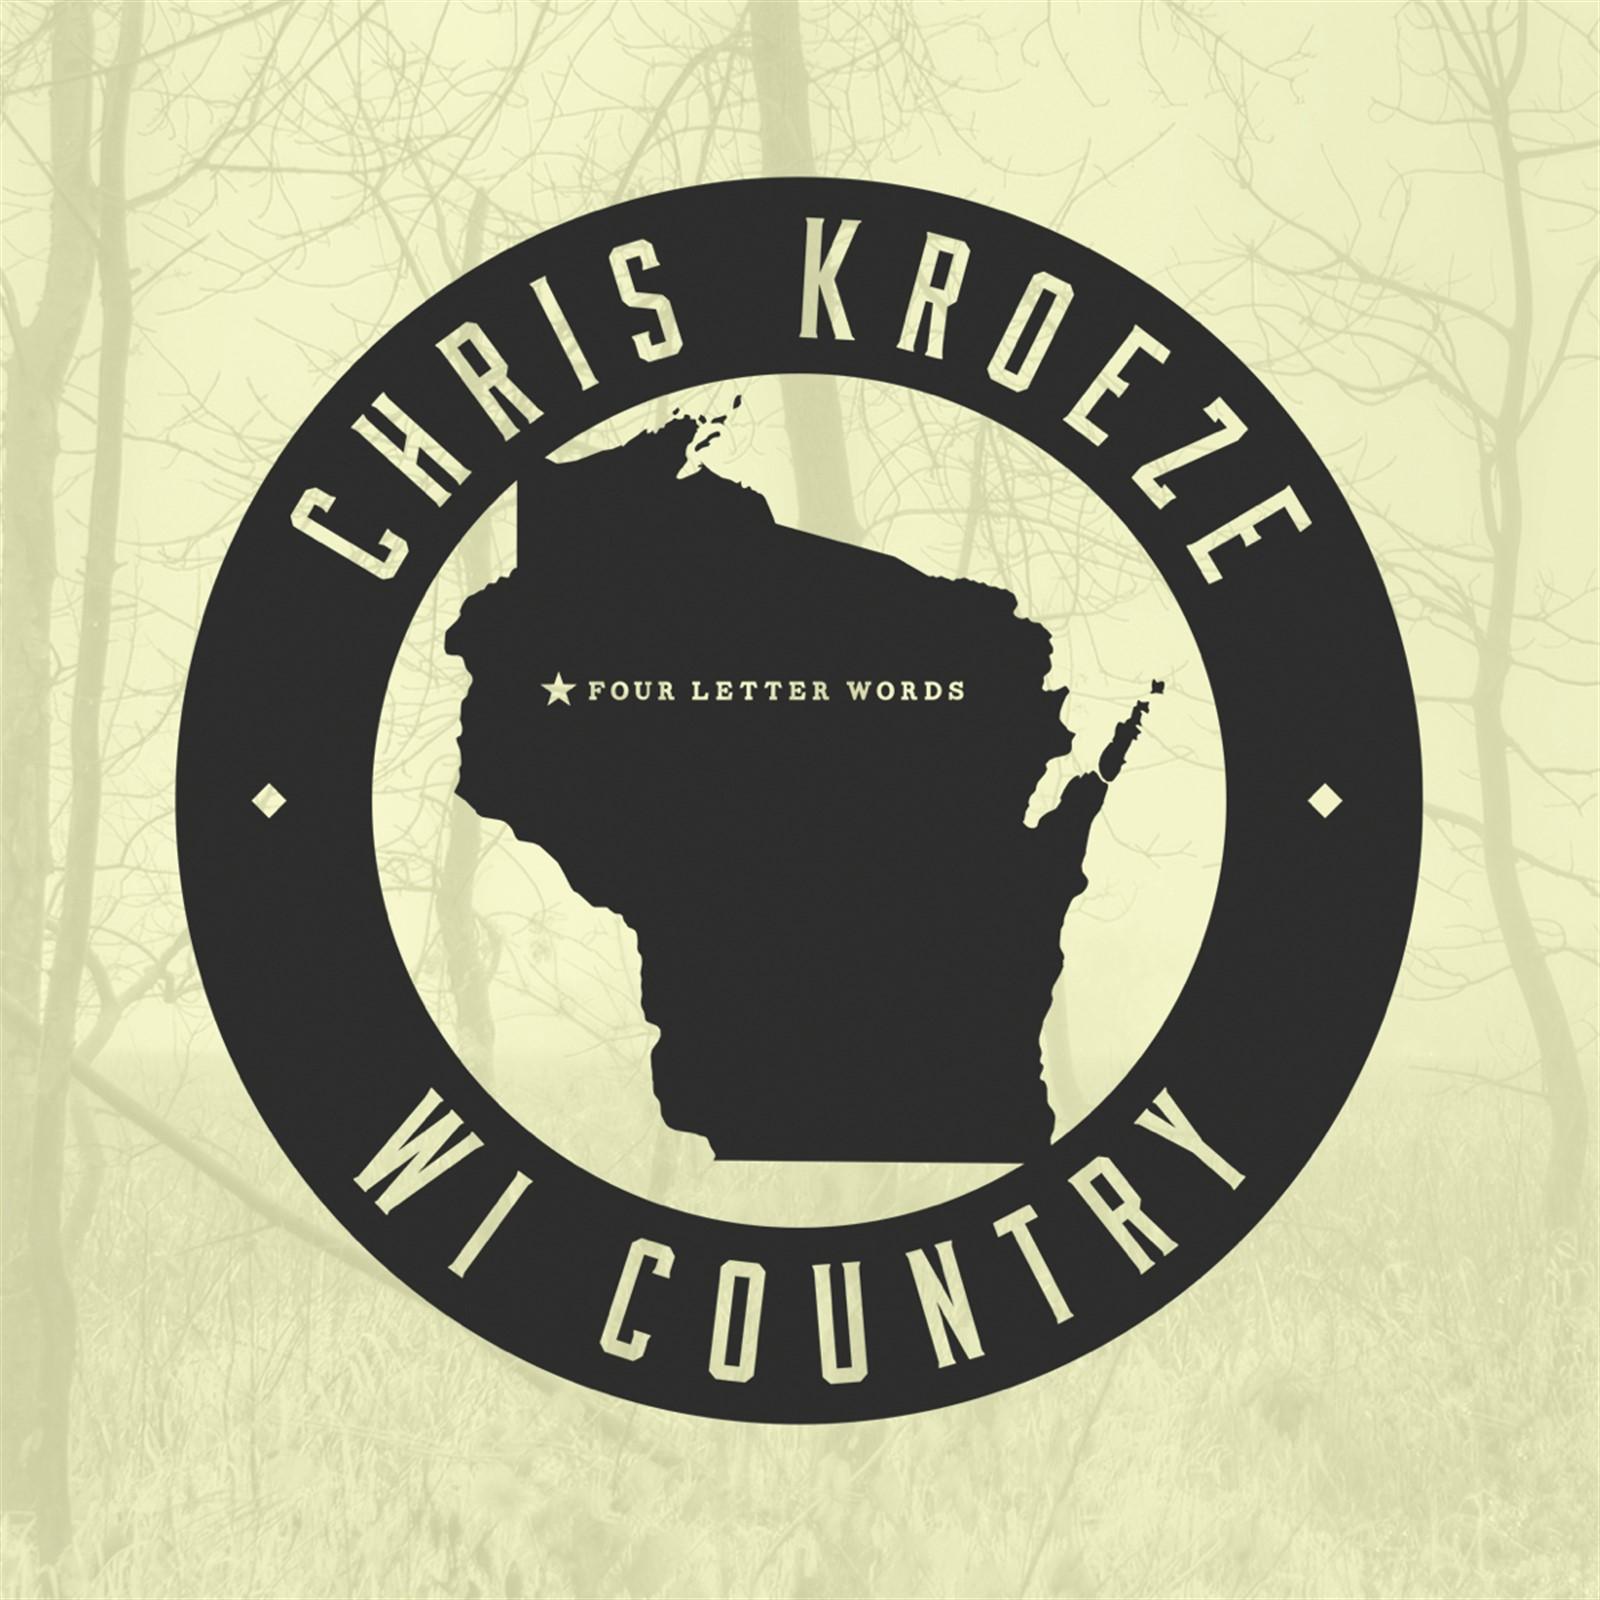 Chris Kroeze CD Cover_1600x1600.JPG